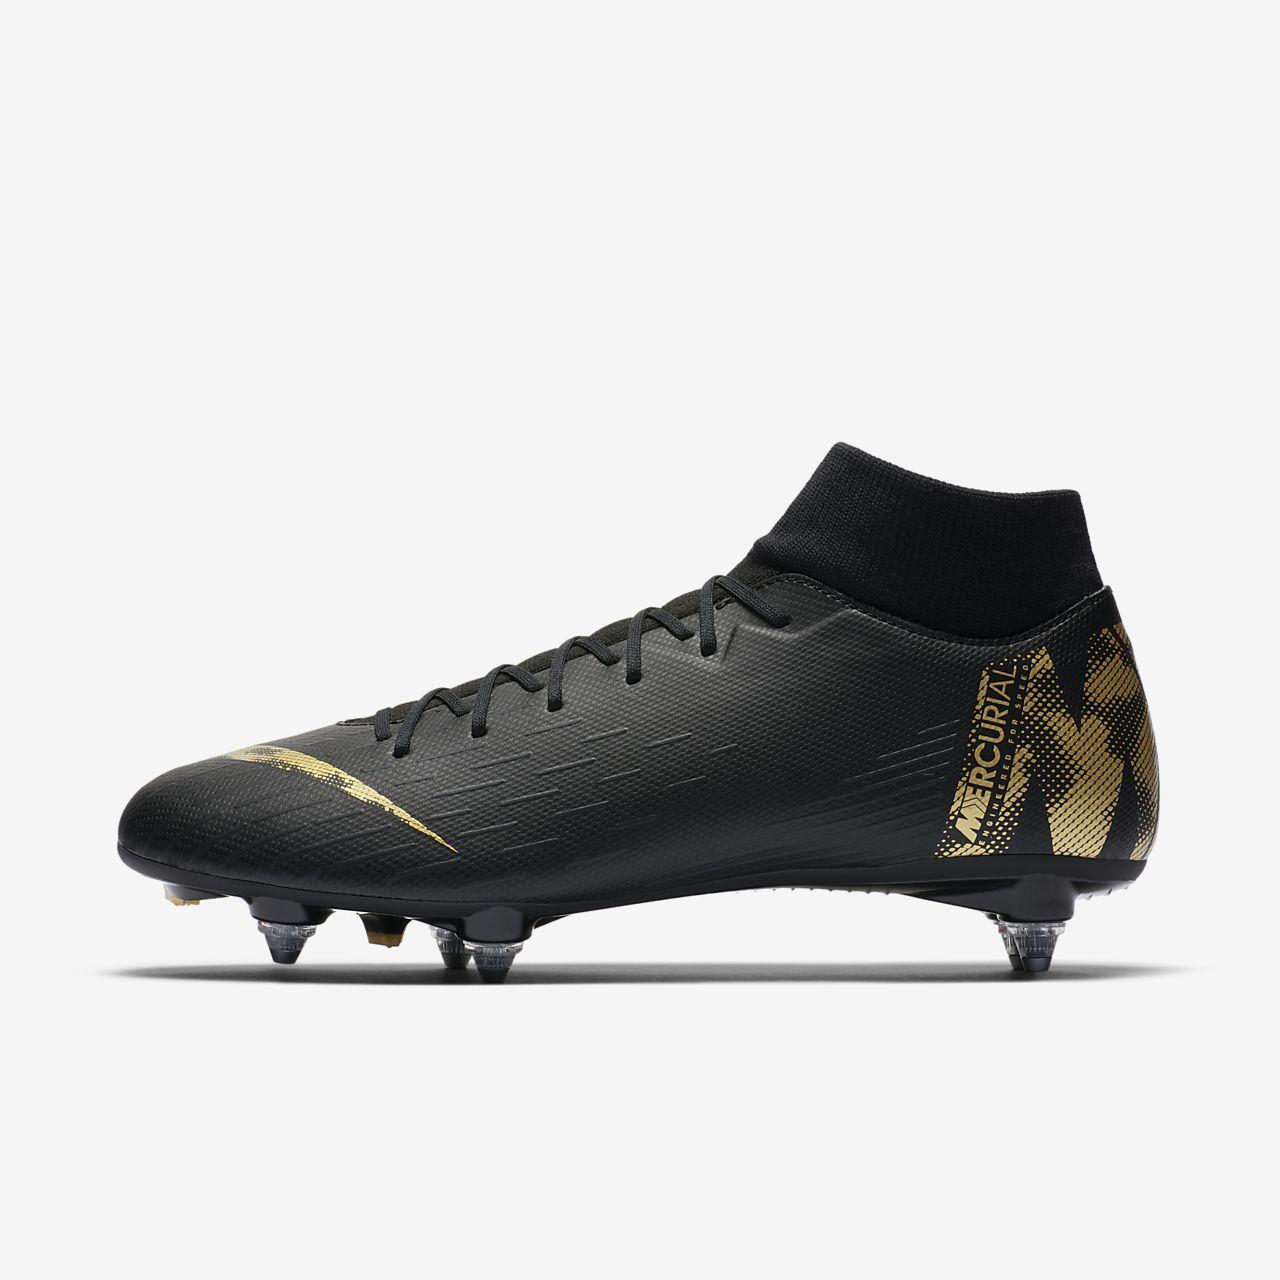 b7609dc6 ... Calzado de fútbol para terreno blando Nike Mercurial Superfly VI  Academy SG-PRO